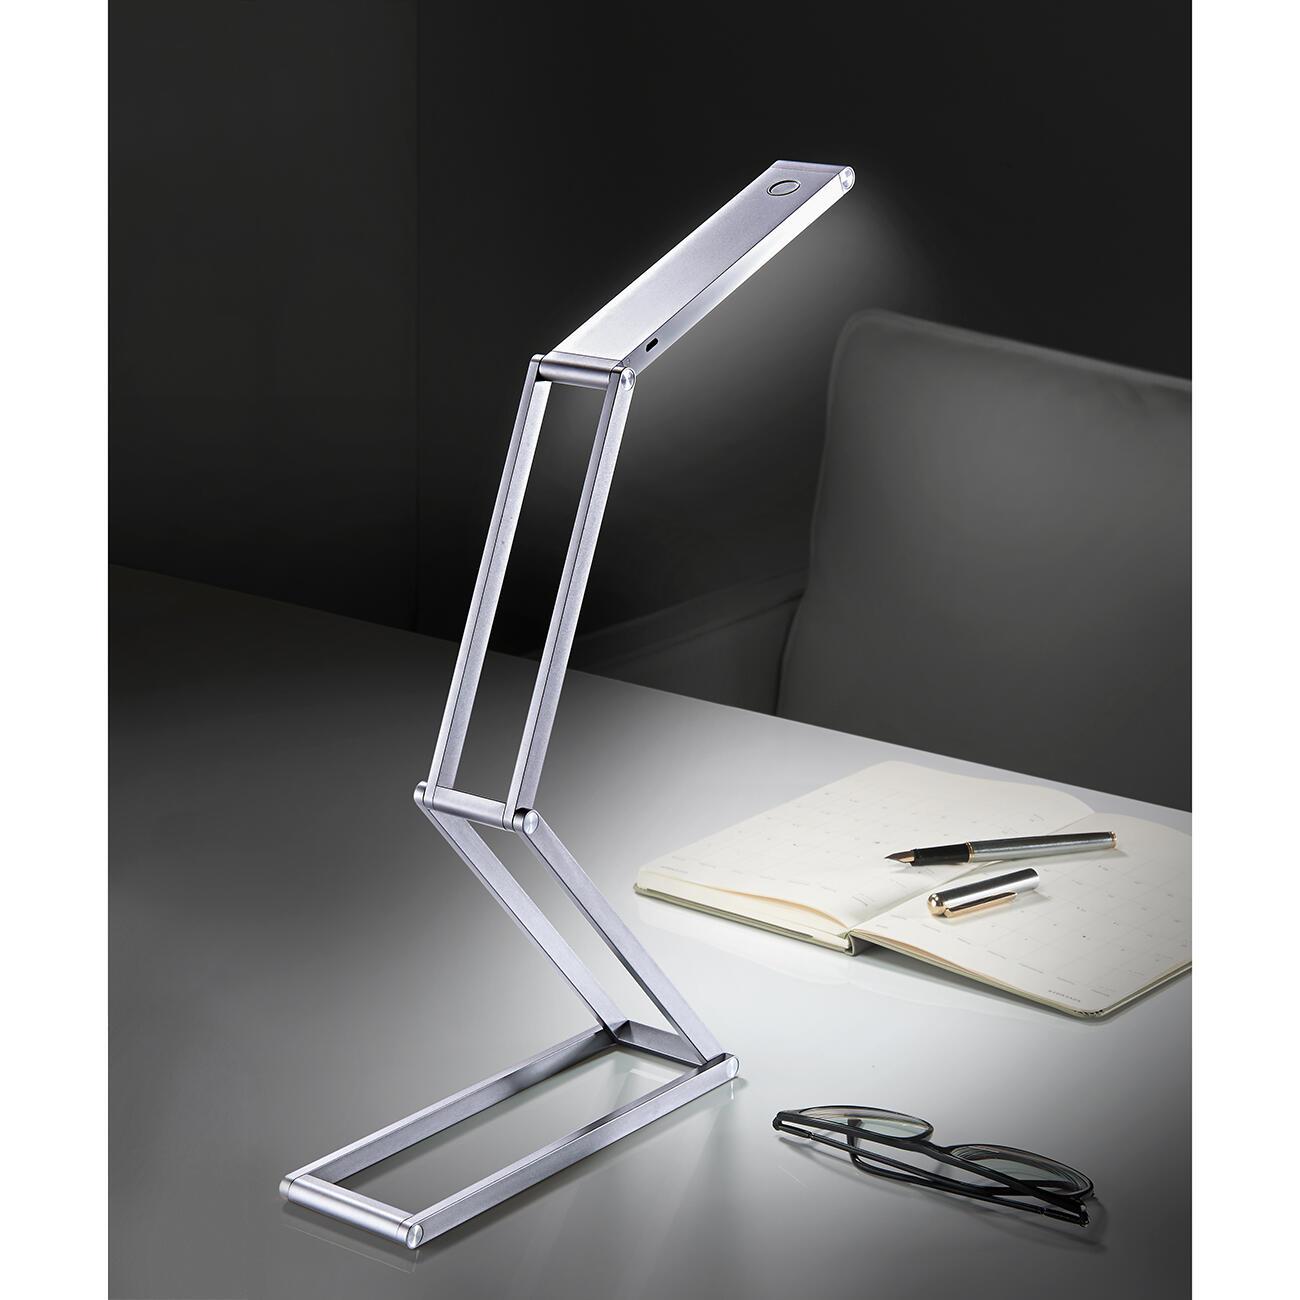 led akku falt leuchte 3 jahre garantie pro idee. Black Bedroom Furniture Sets. Home Design Ideas